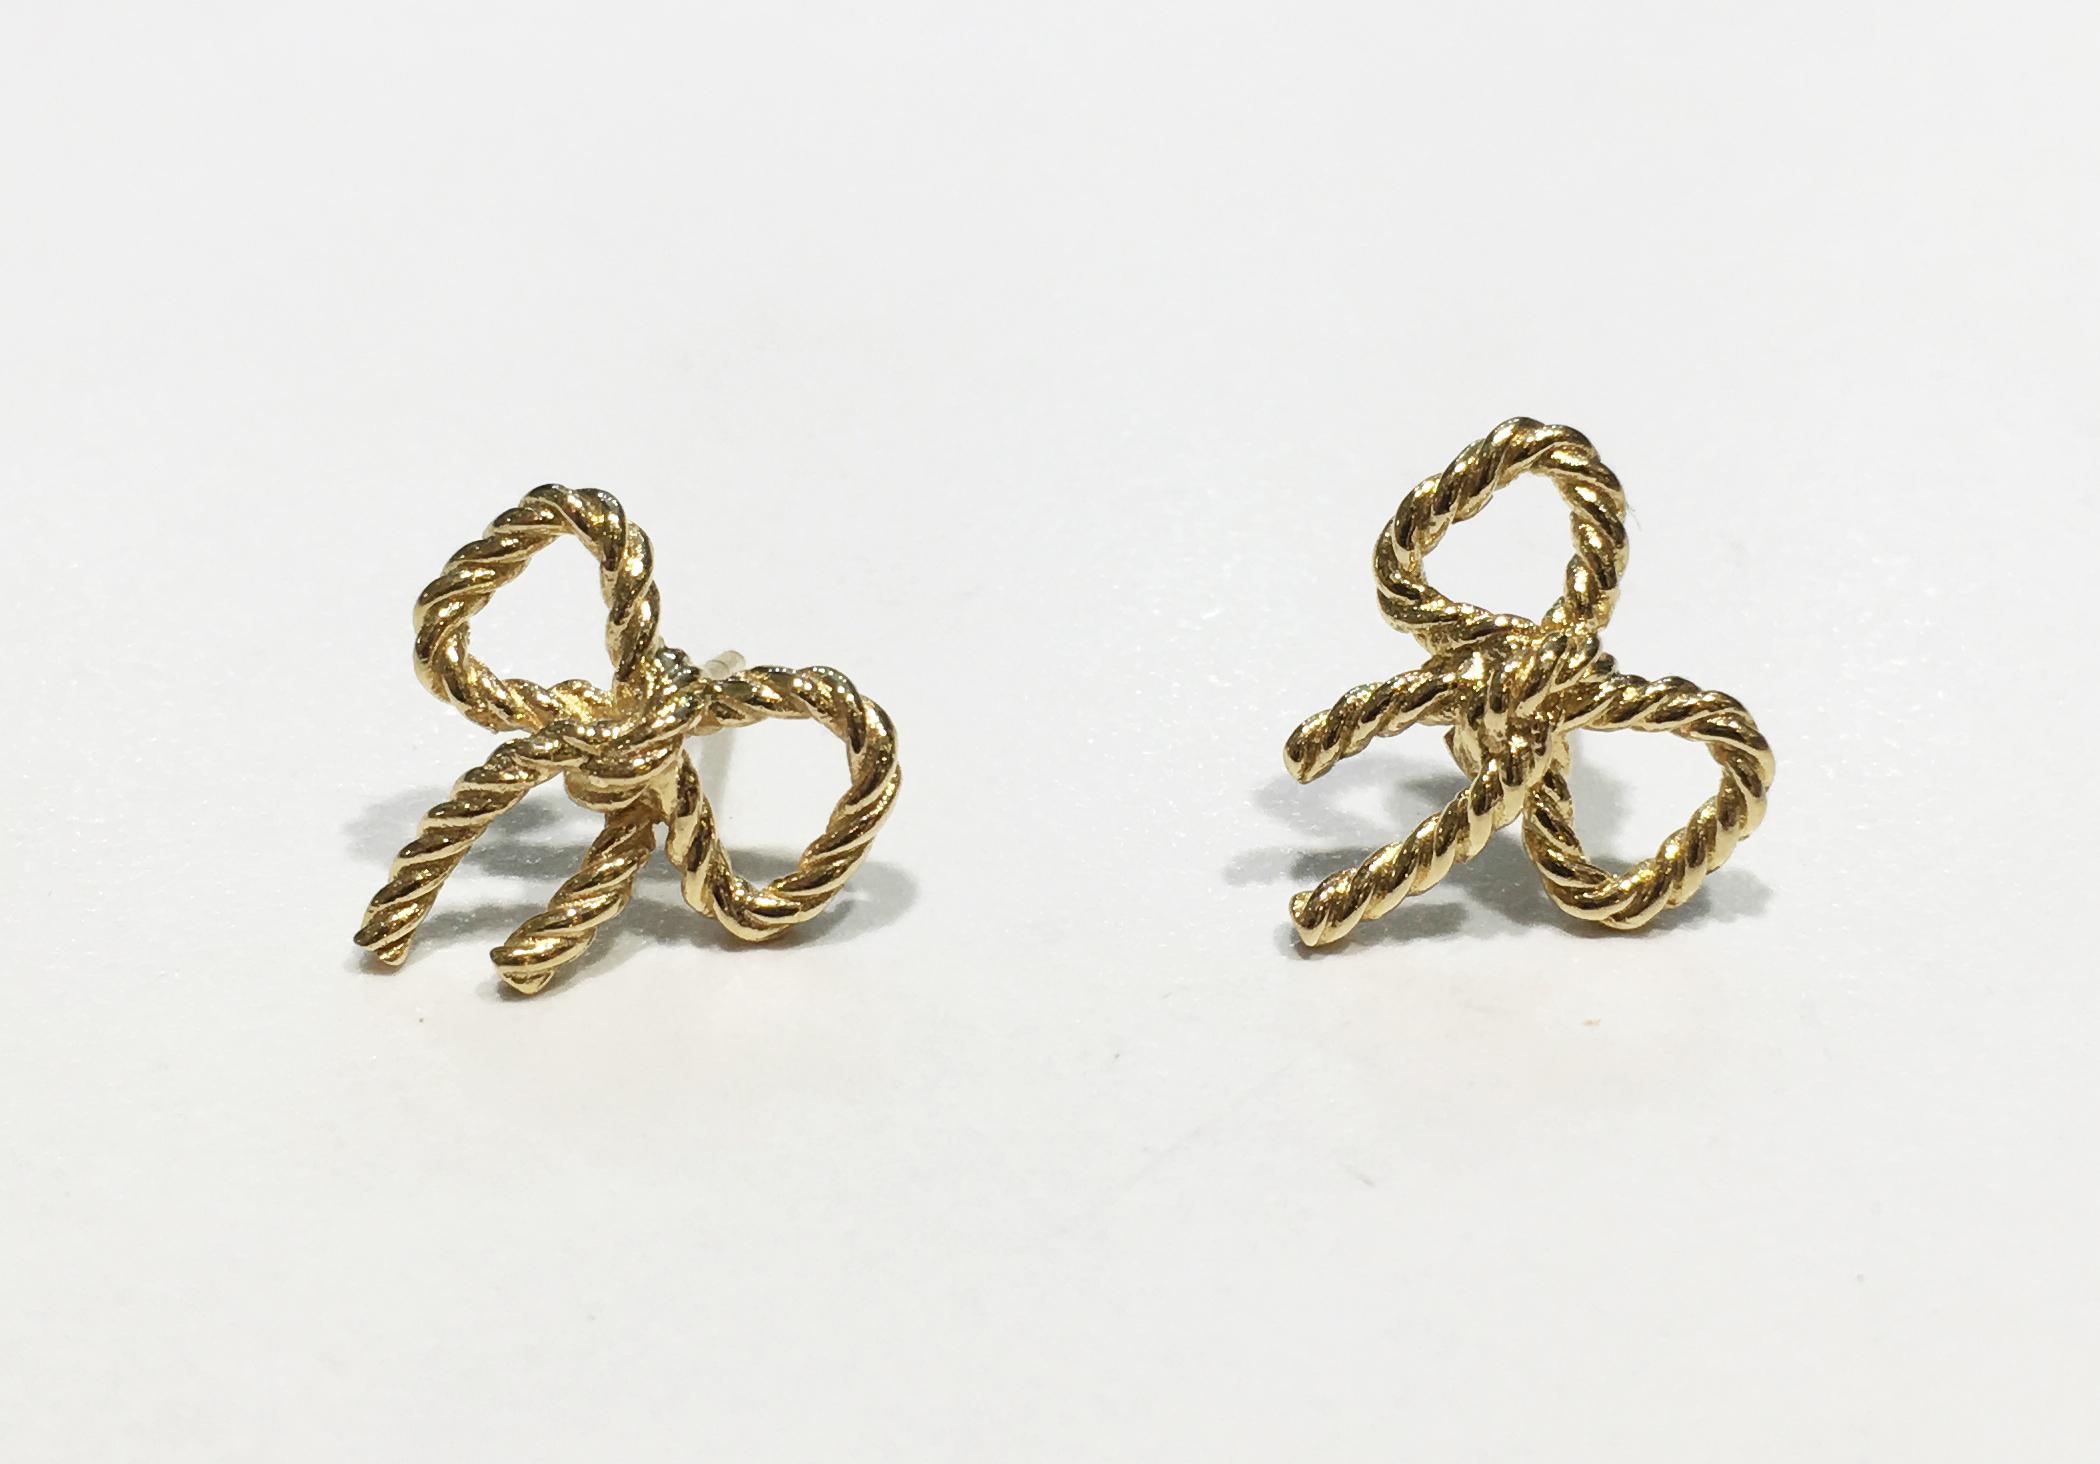 Dainty Stud Earrings Angela Bloody Mary Tortoise Earrings Tortoise Shell Stud Earrings Minimalist Stud Earrings Tortoise Shell Earrings